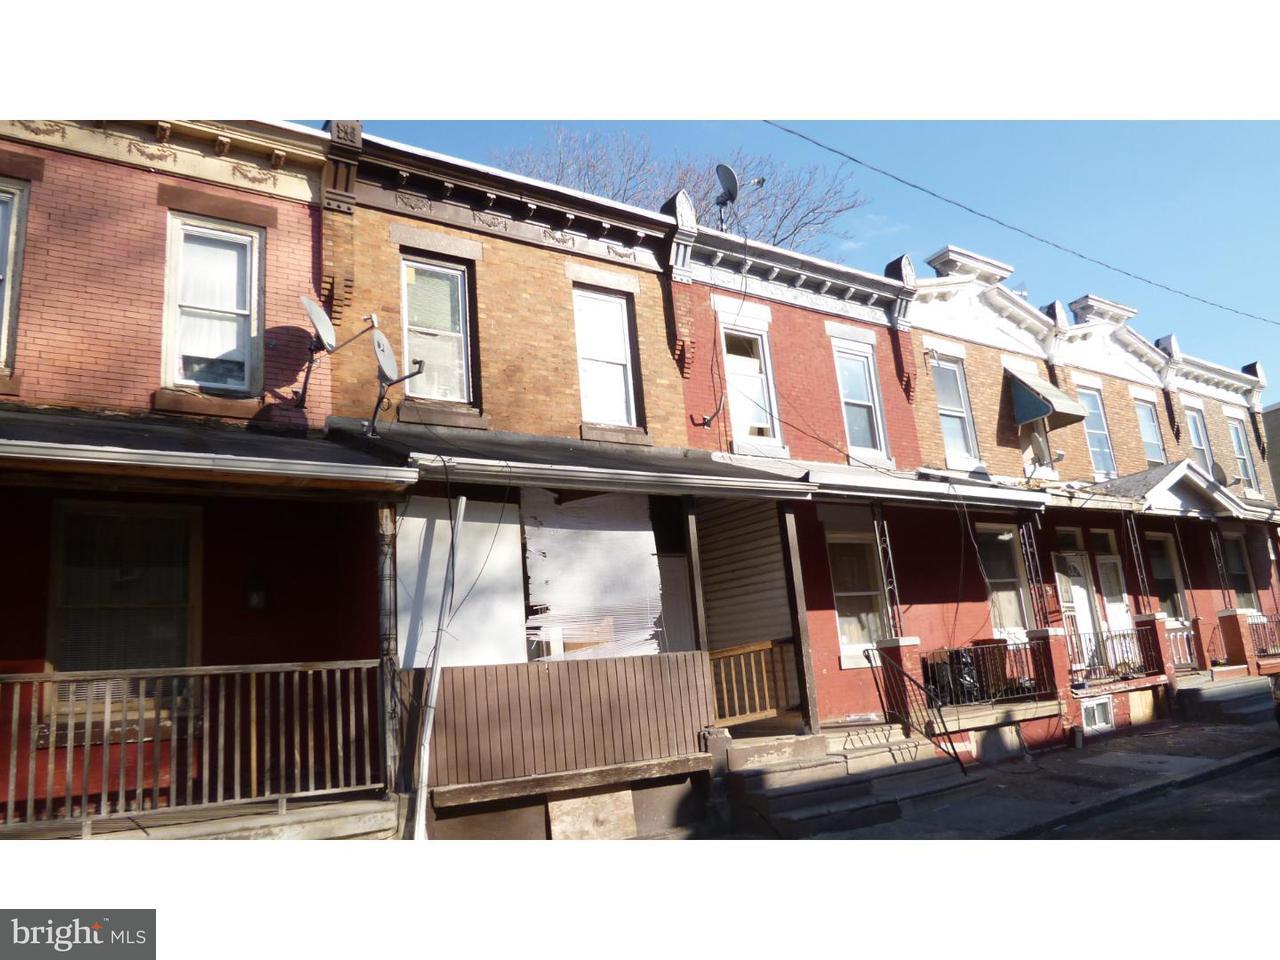 3049 N Sydenham Philadelphia , PA 19132